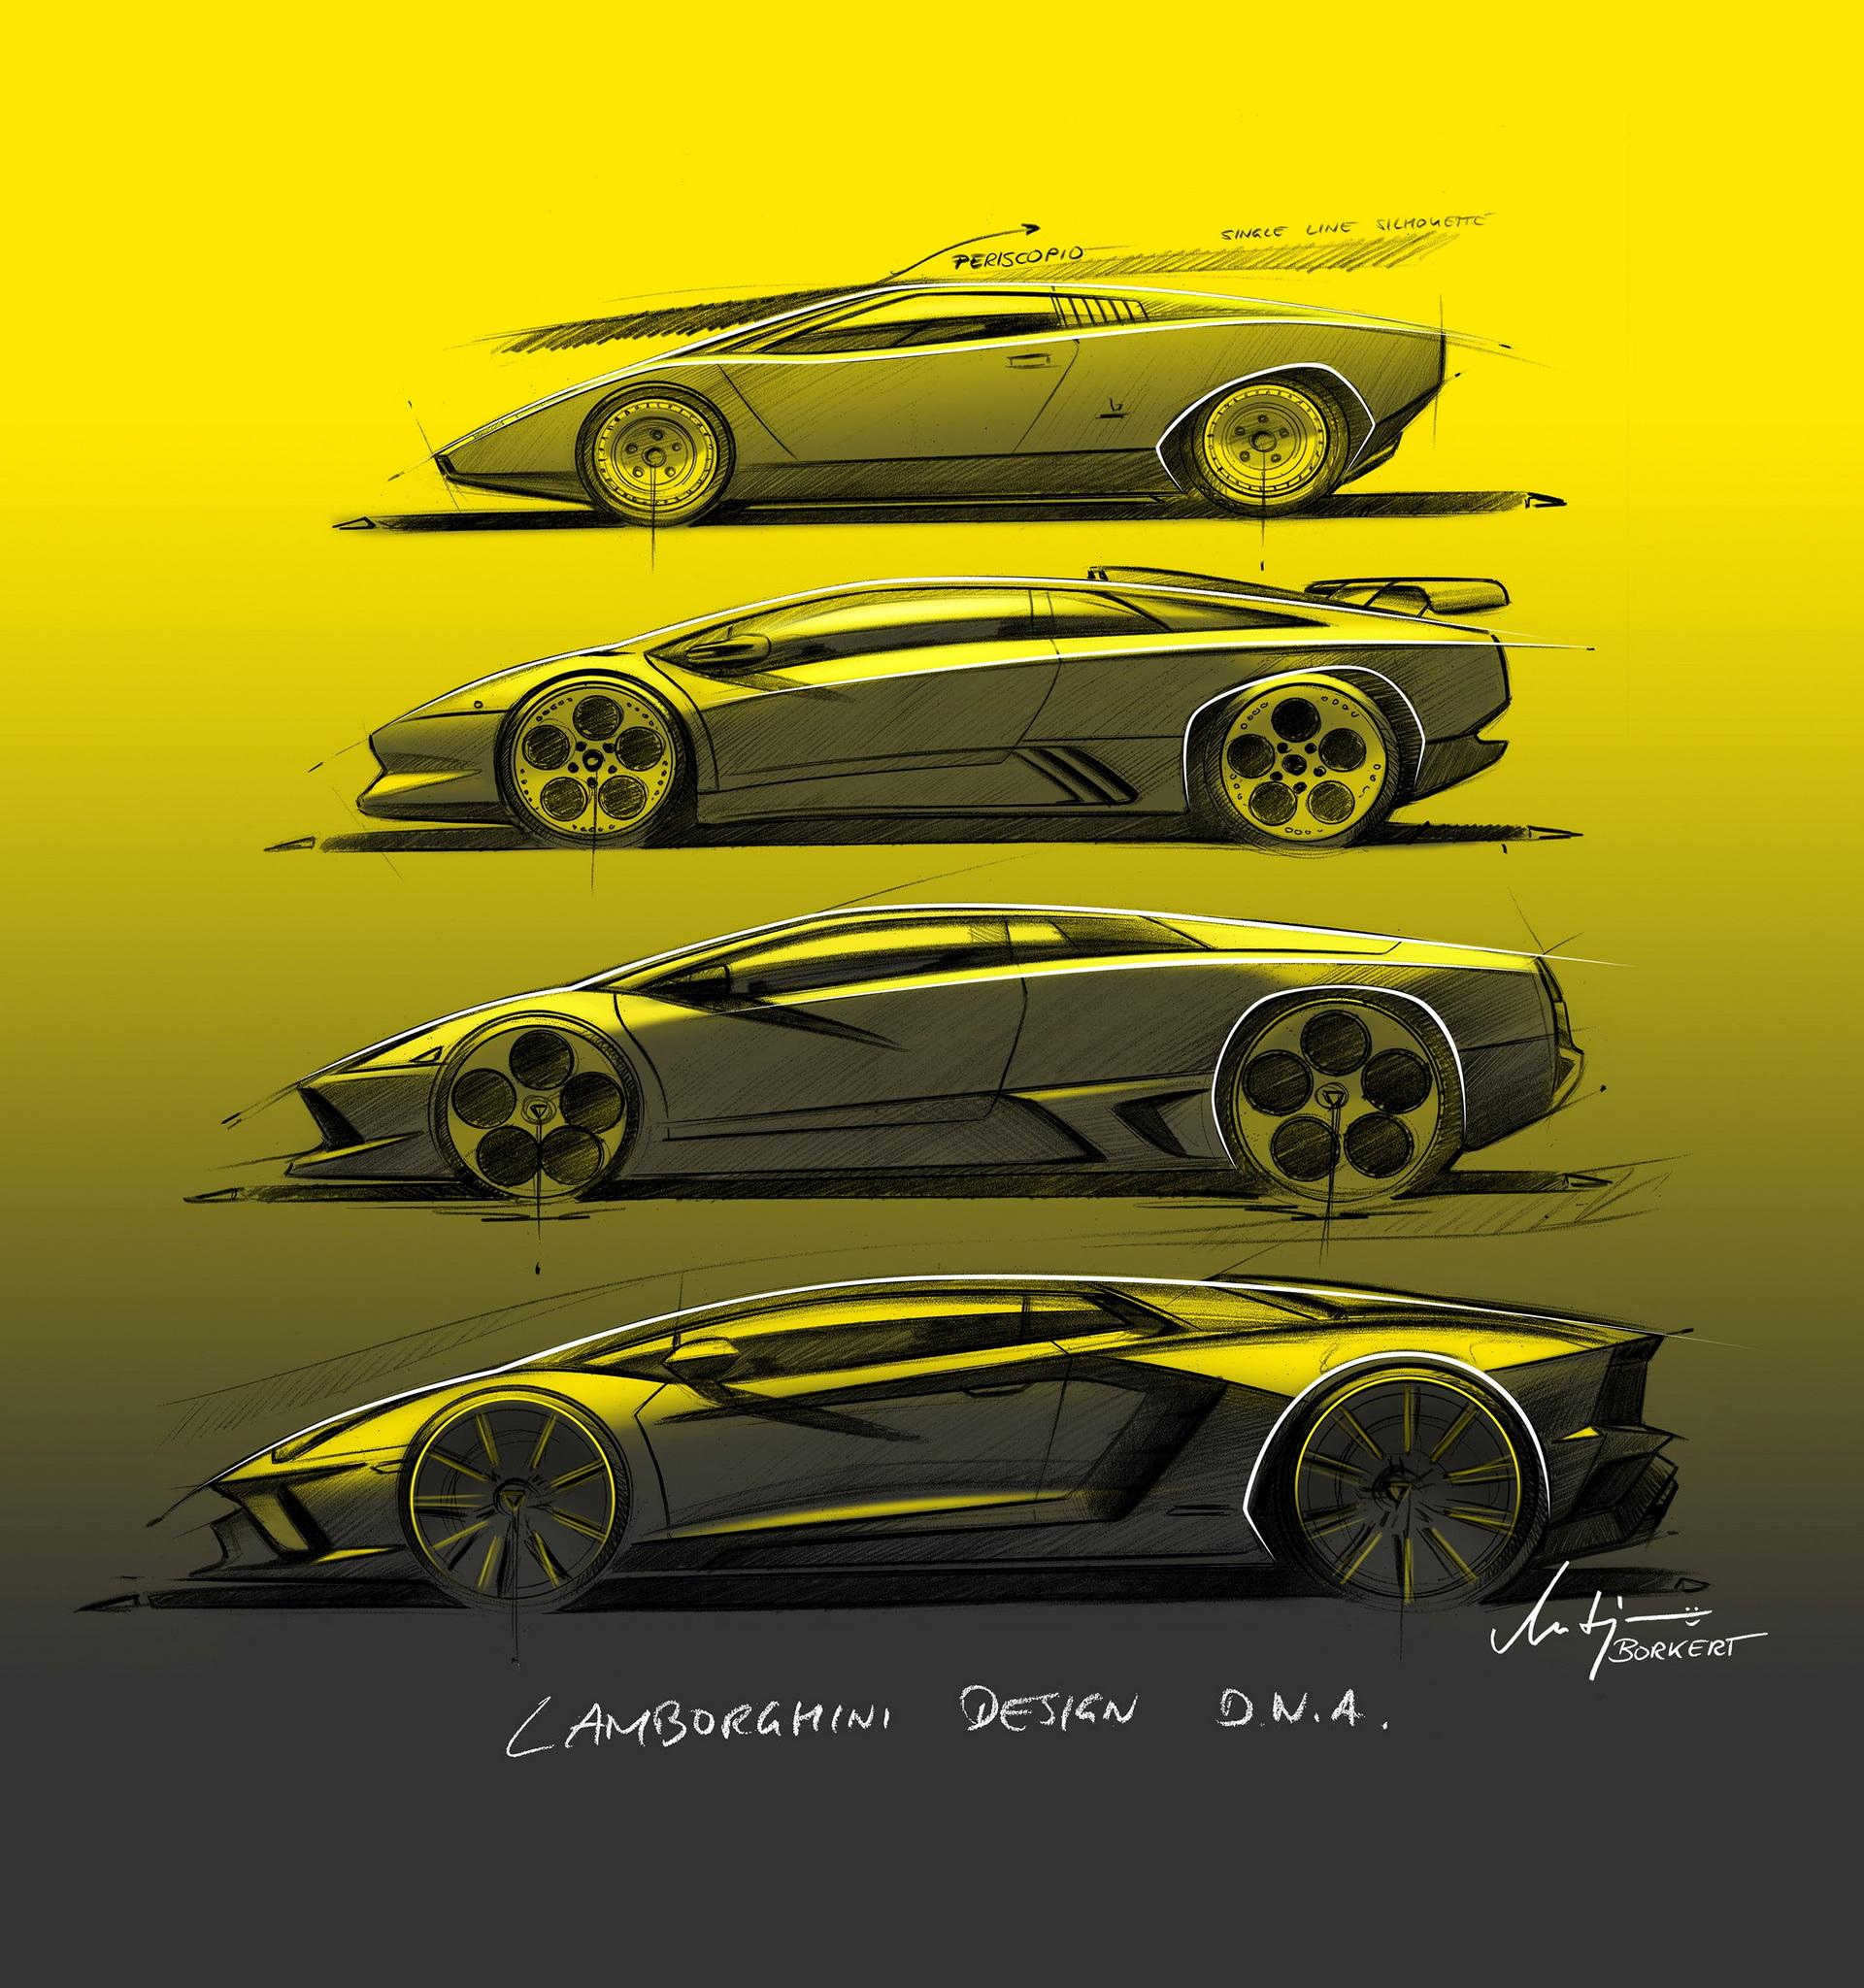 1971-Lamborghini-Countach-Design-DNA-3.jpg